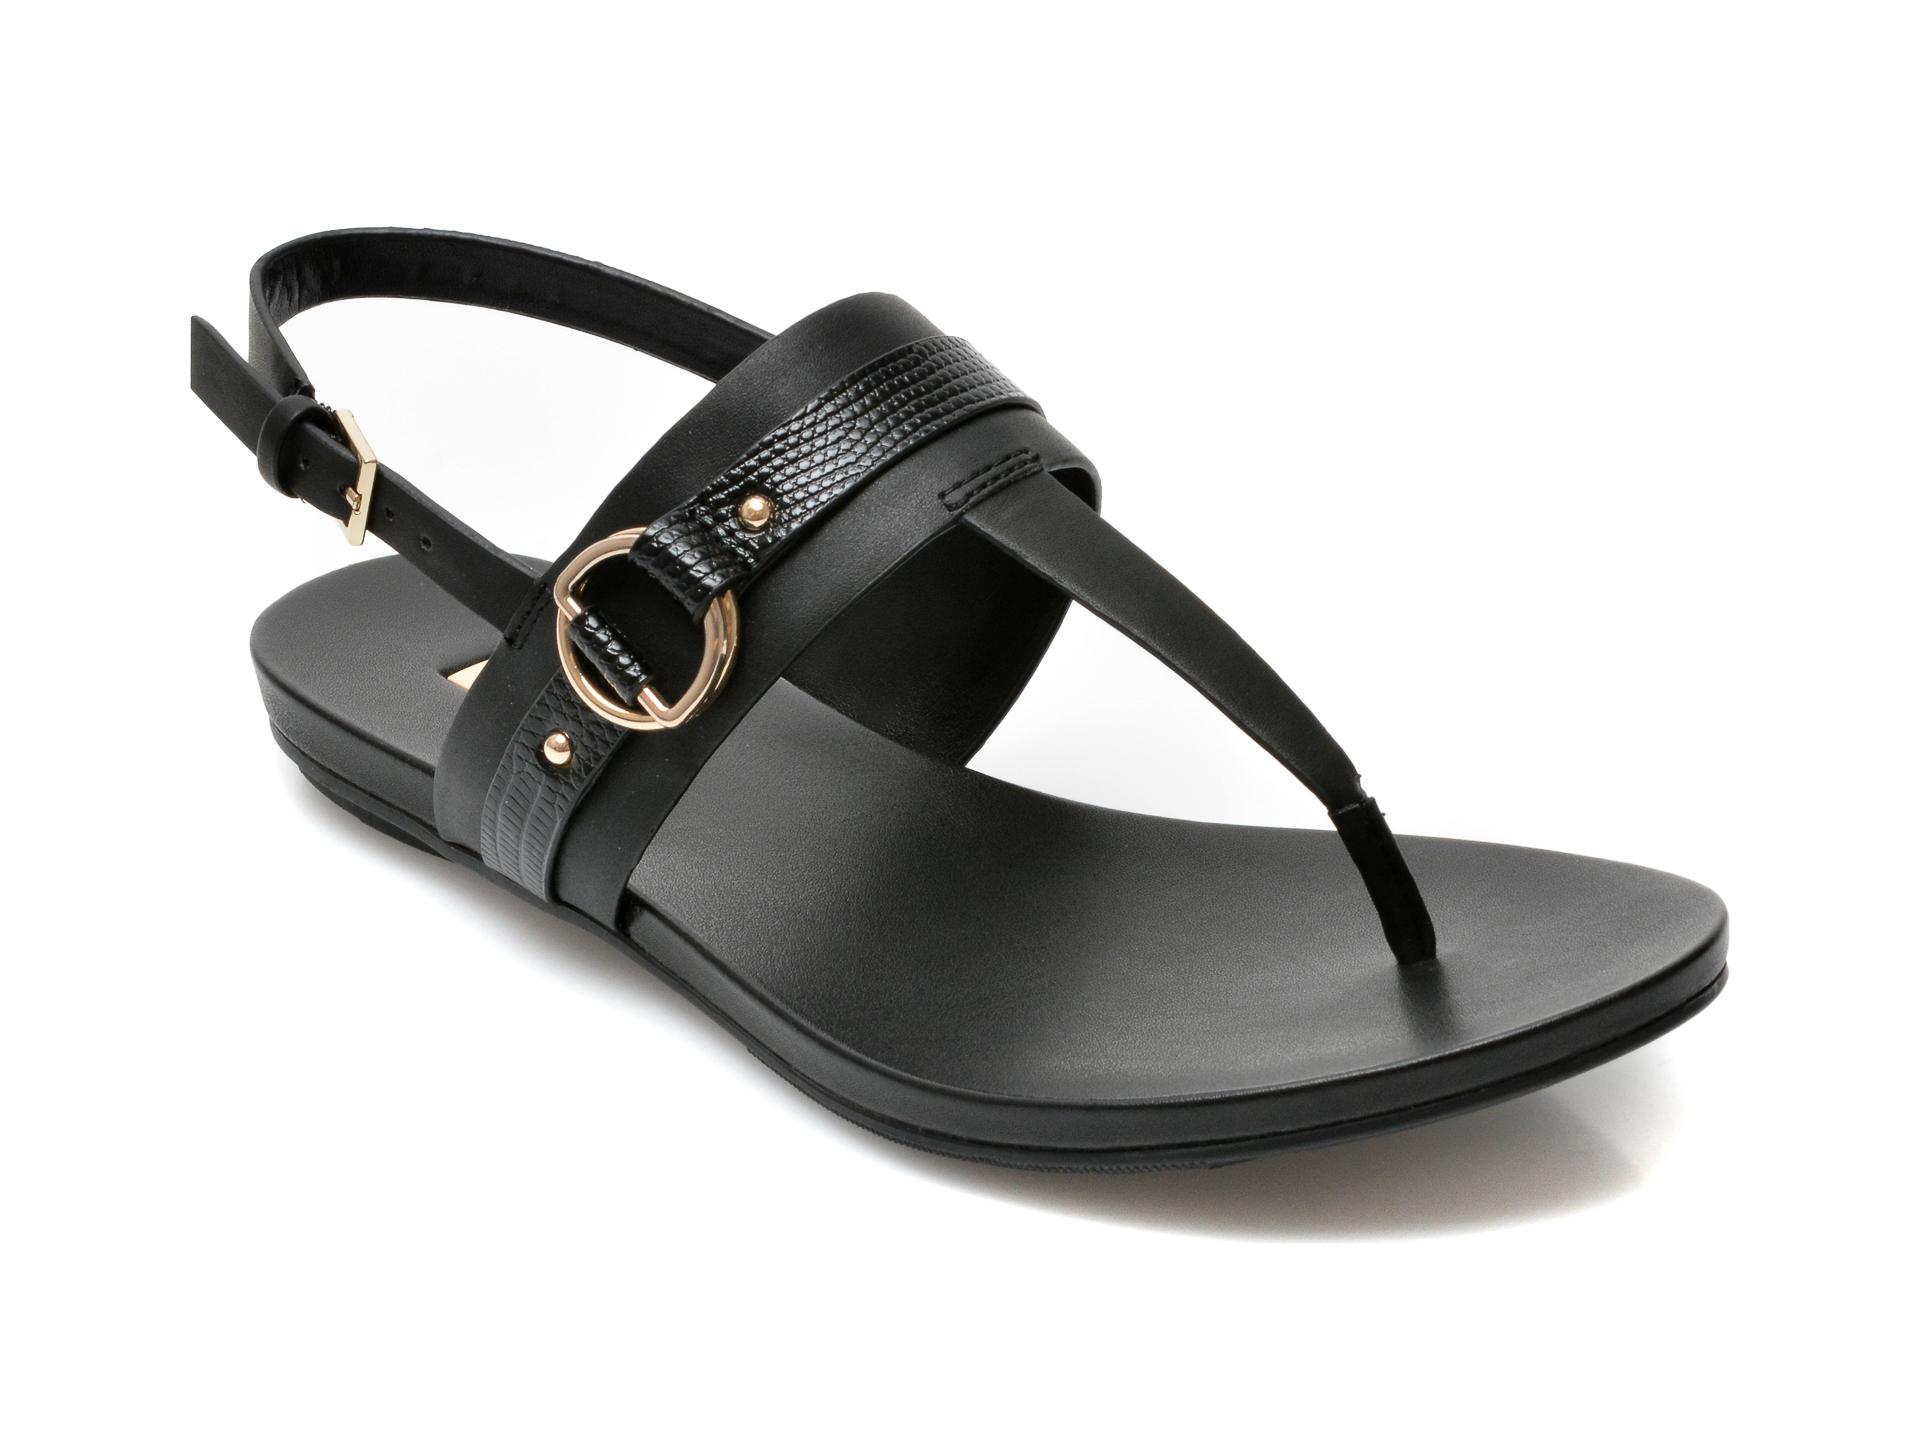 Sandale ALDO negre, Pandra001, din piele ecologica imagine otter.ro